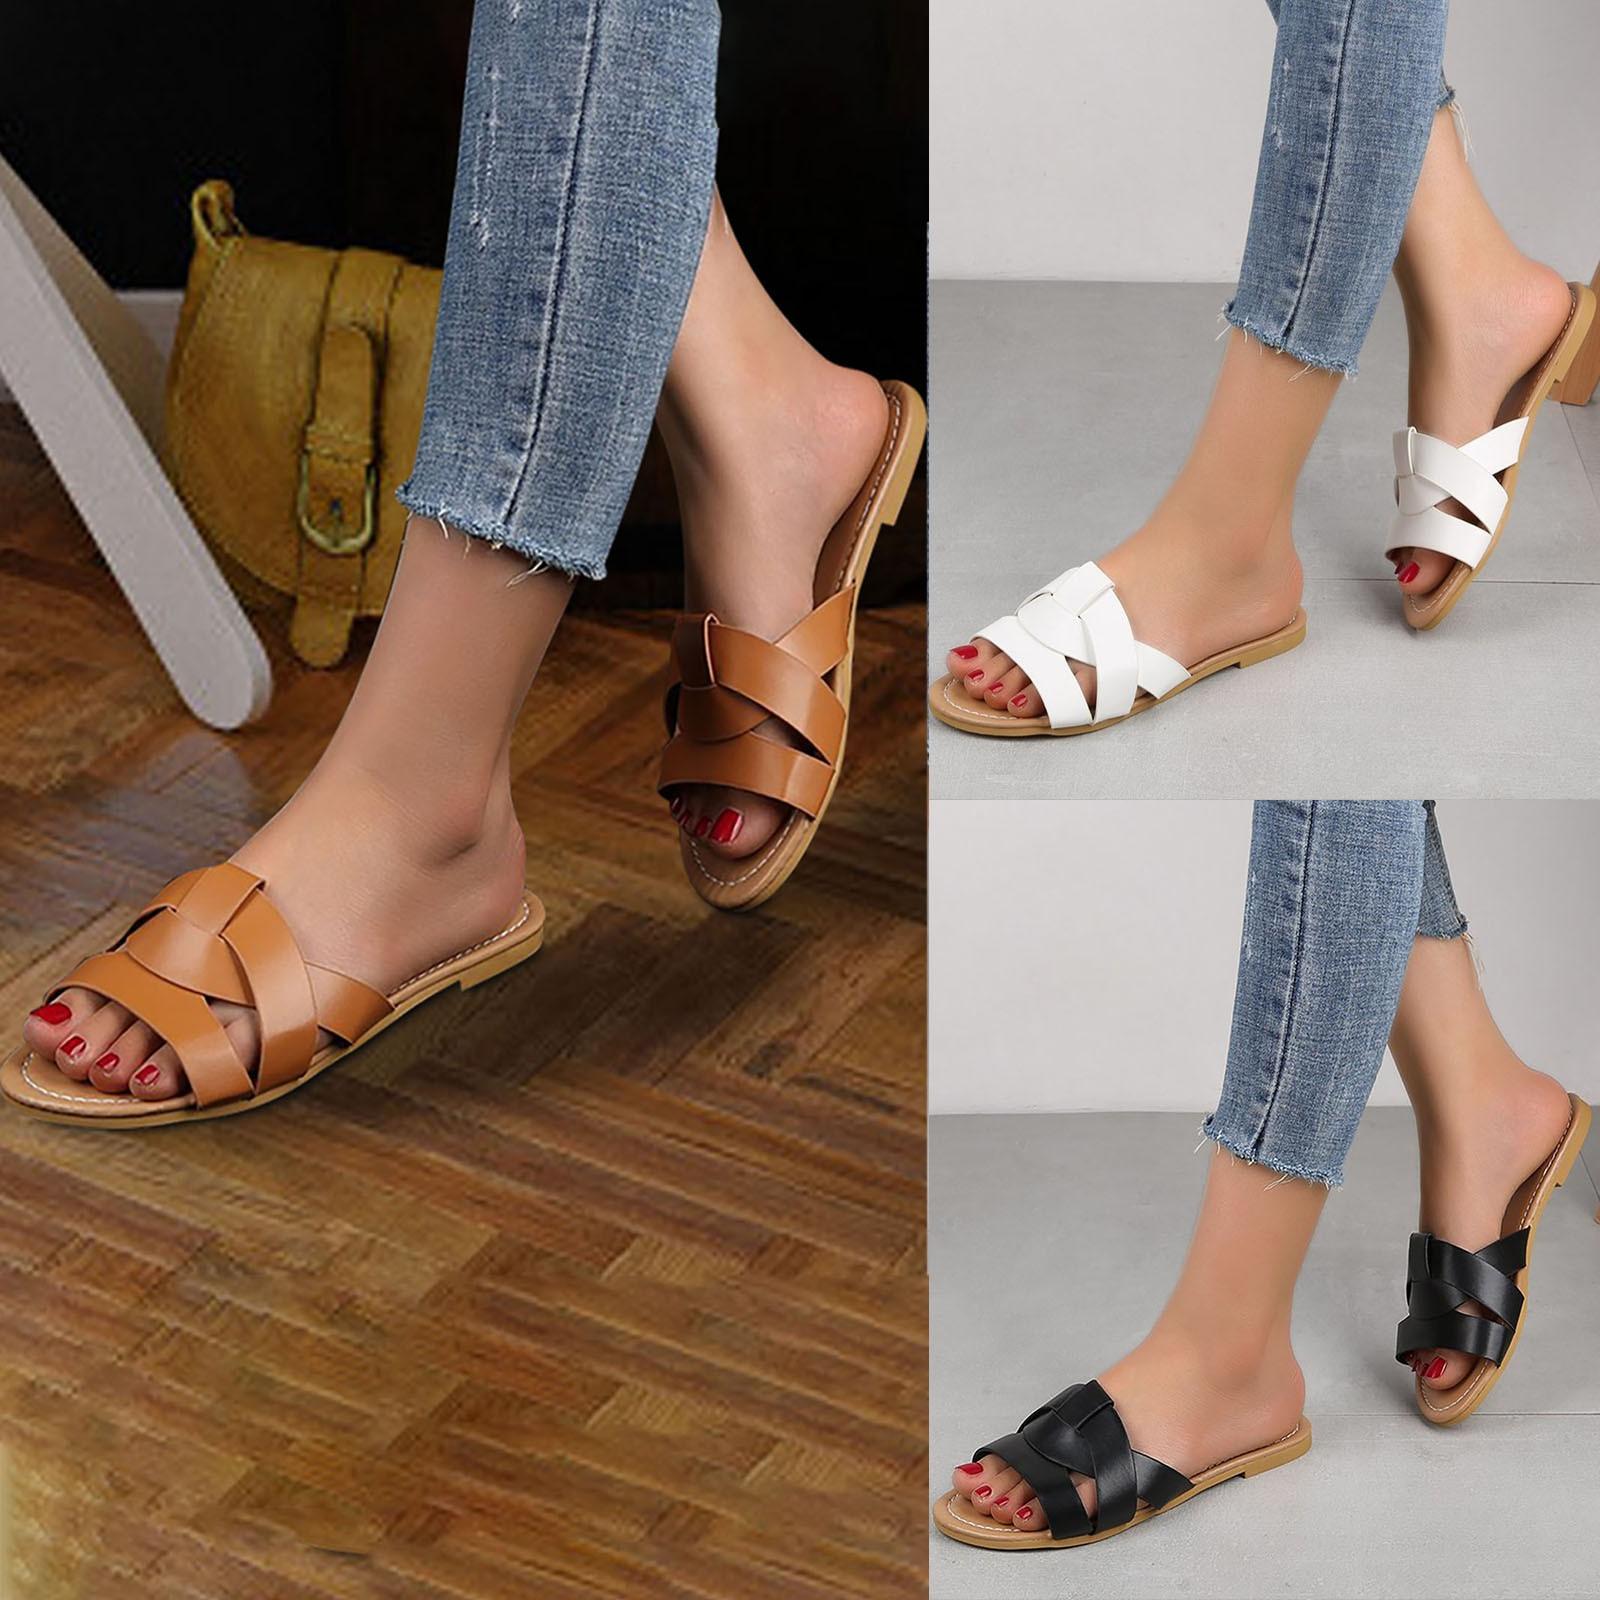 Summer Leisure Beach Shoes One-flip Cross Open Toe Flat Sandals For Women sandalias mujer chaussure